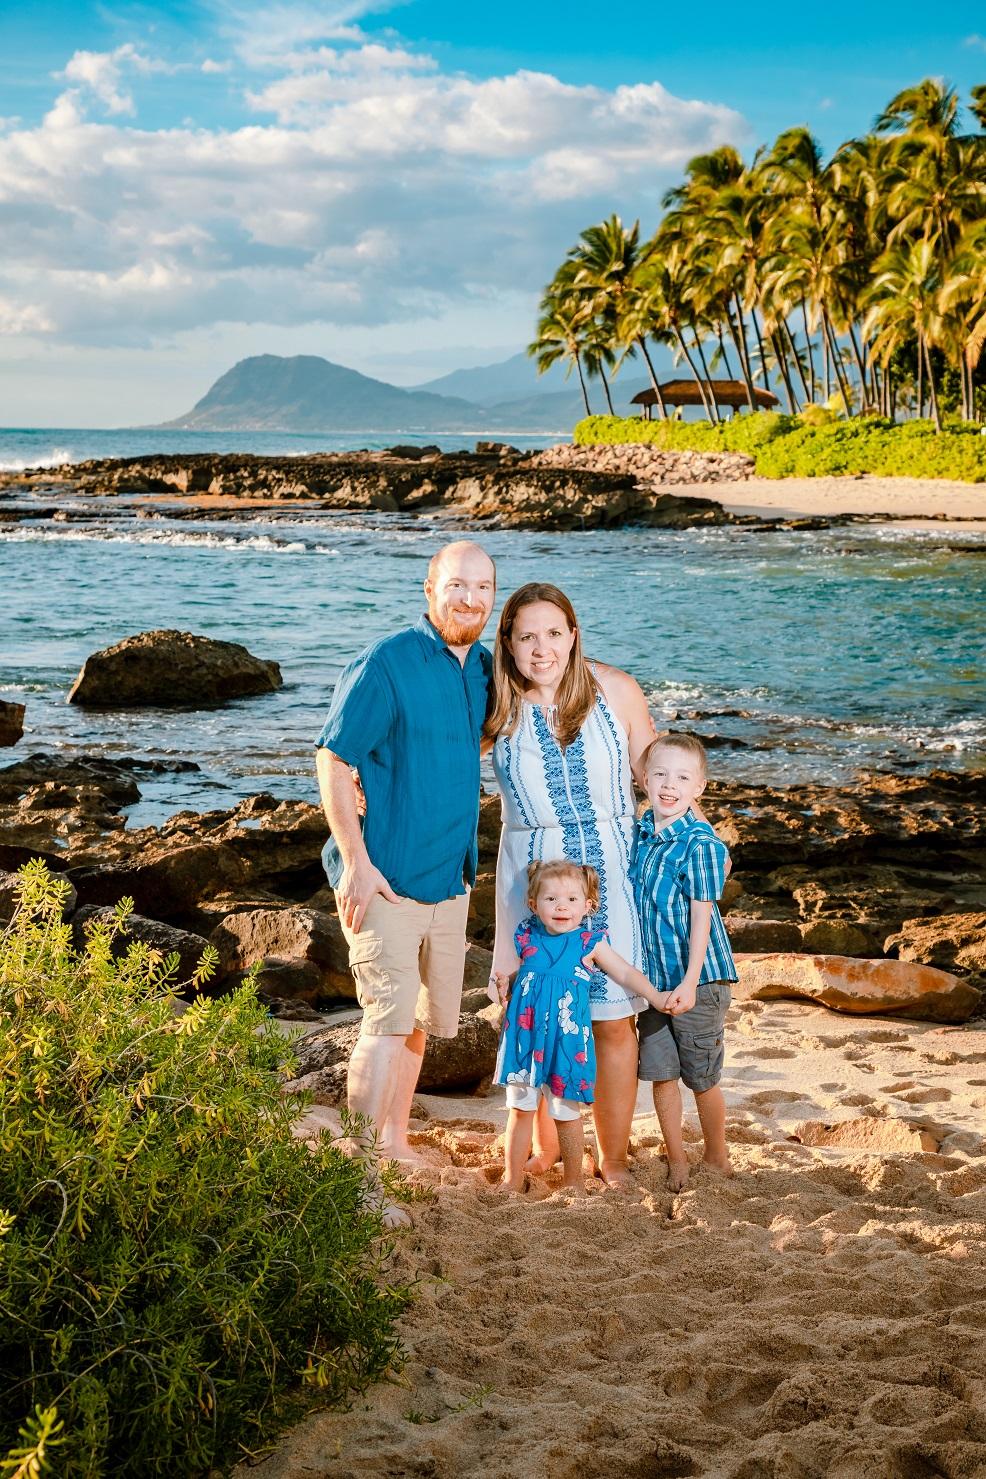 Oahu2018-48455.jpg